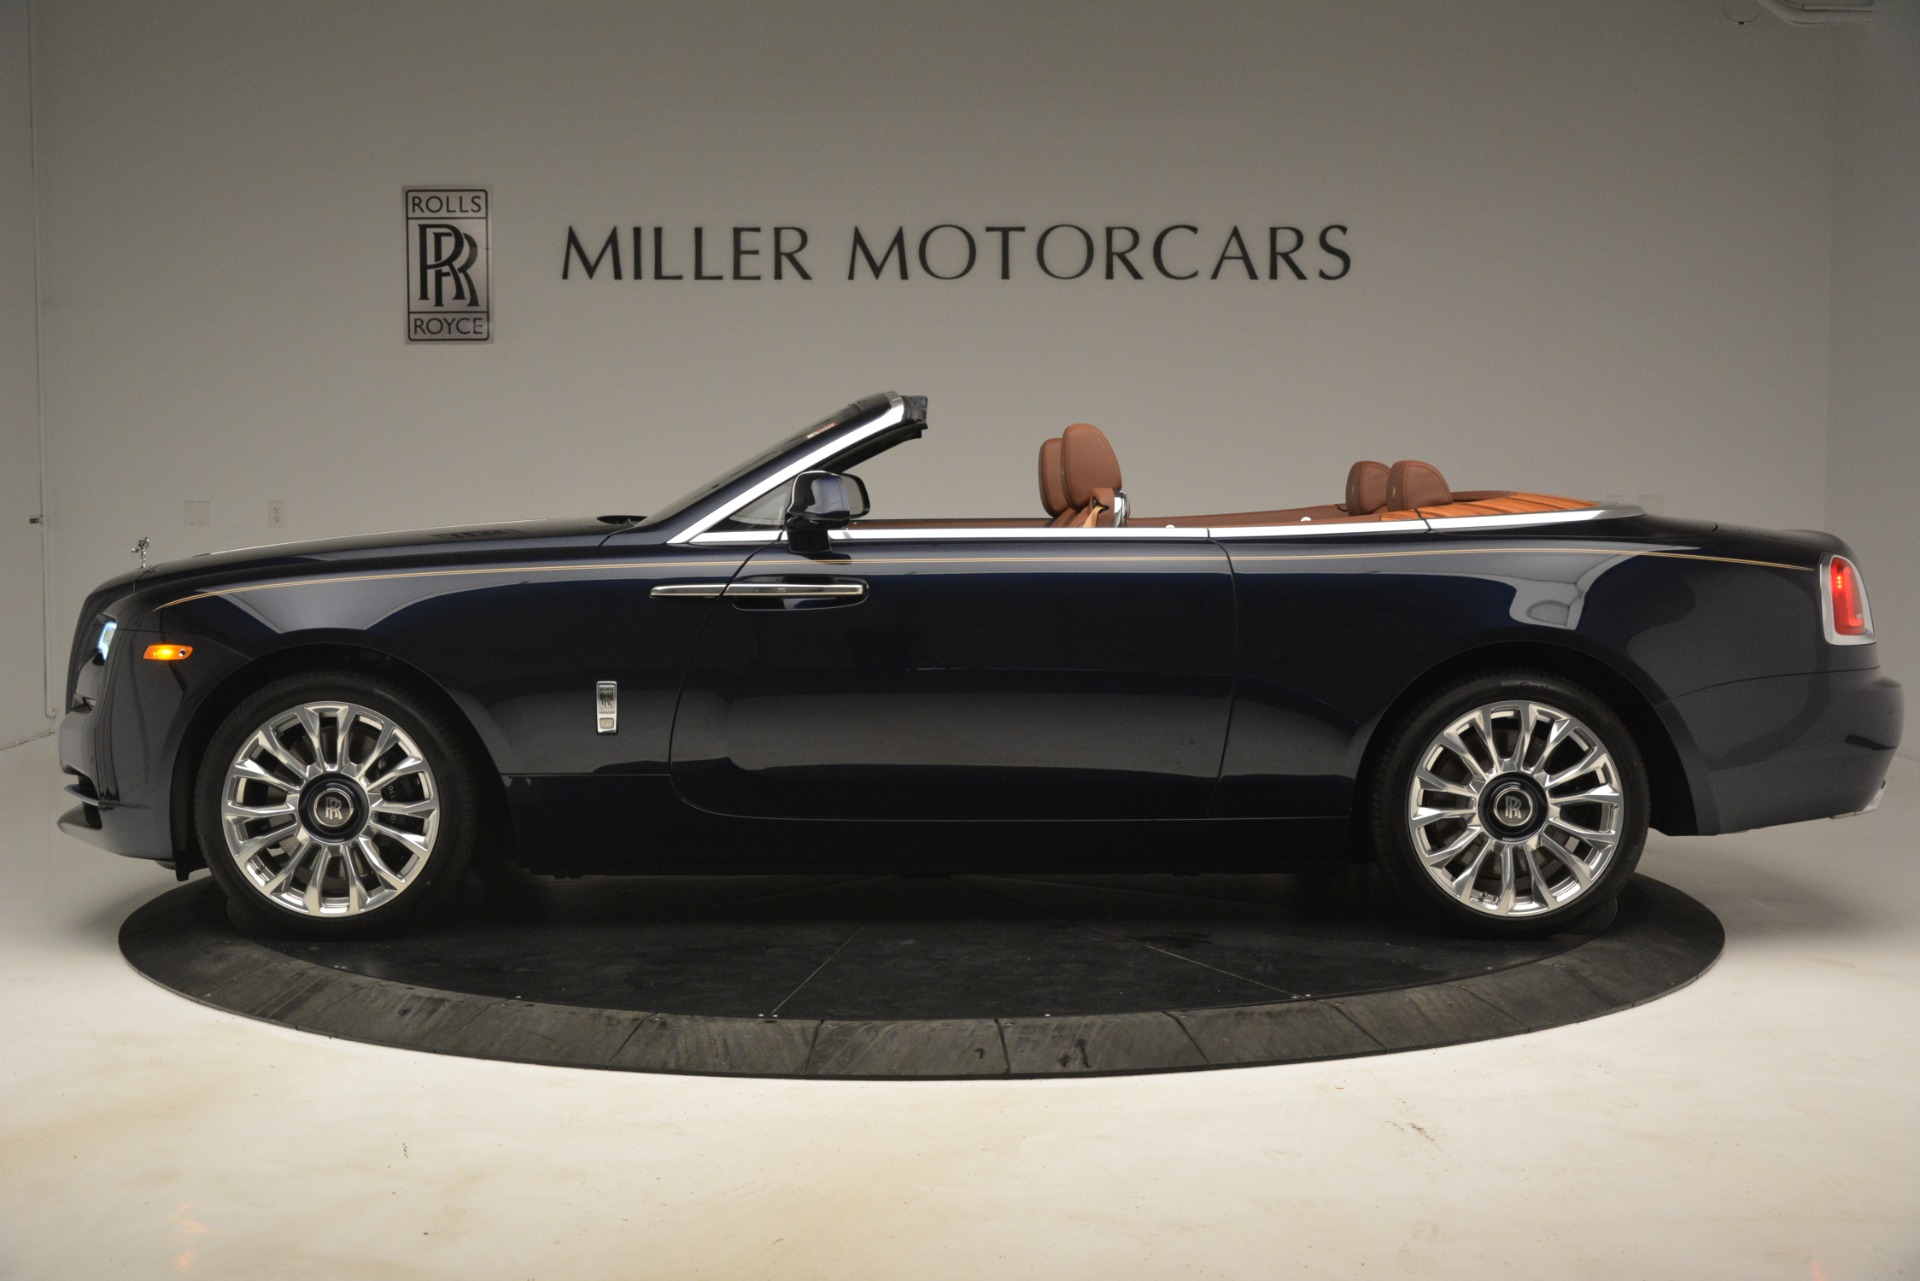 New 2019 Rolls-Royce Dawn  For Sale In Greenwich, CT 2723_p4